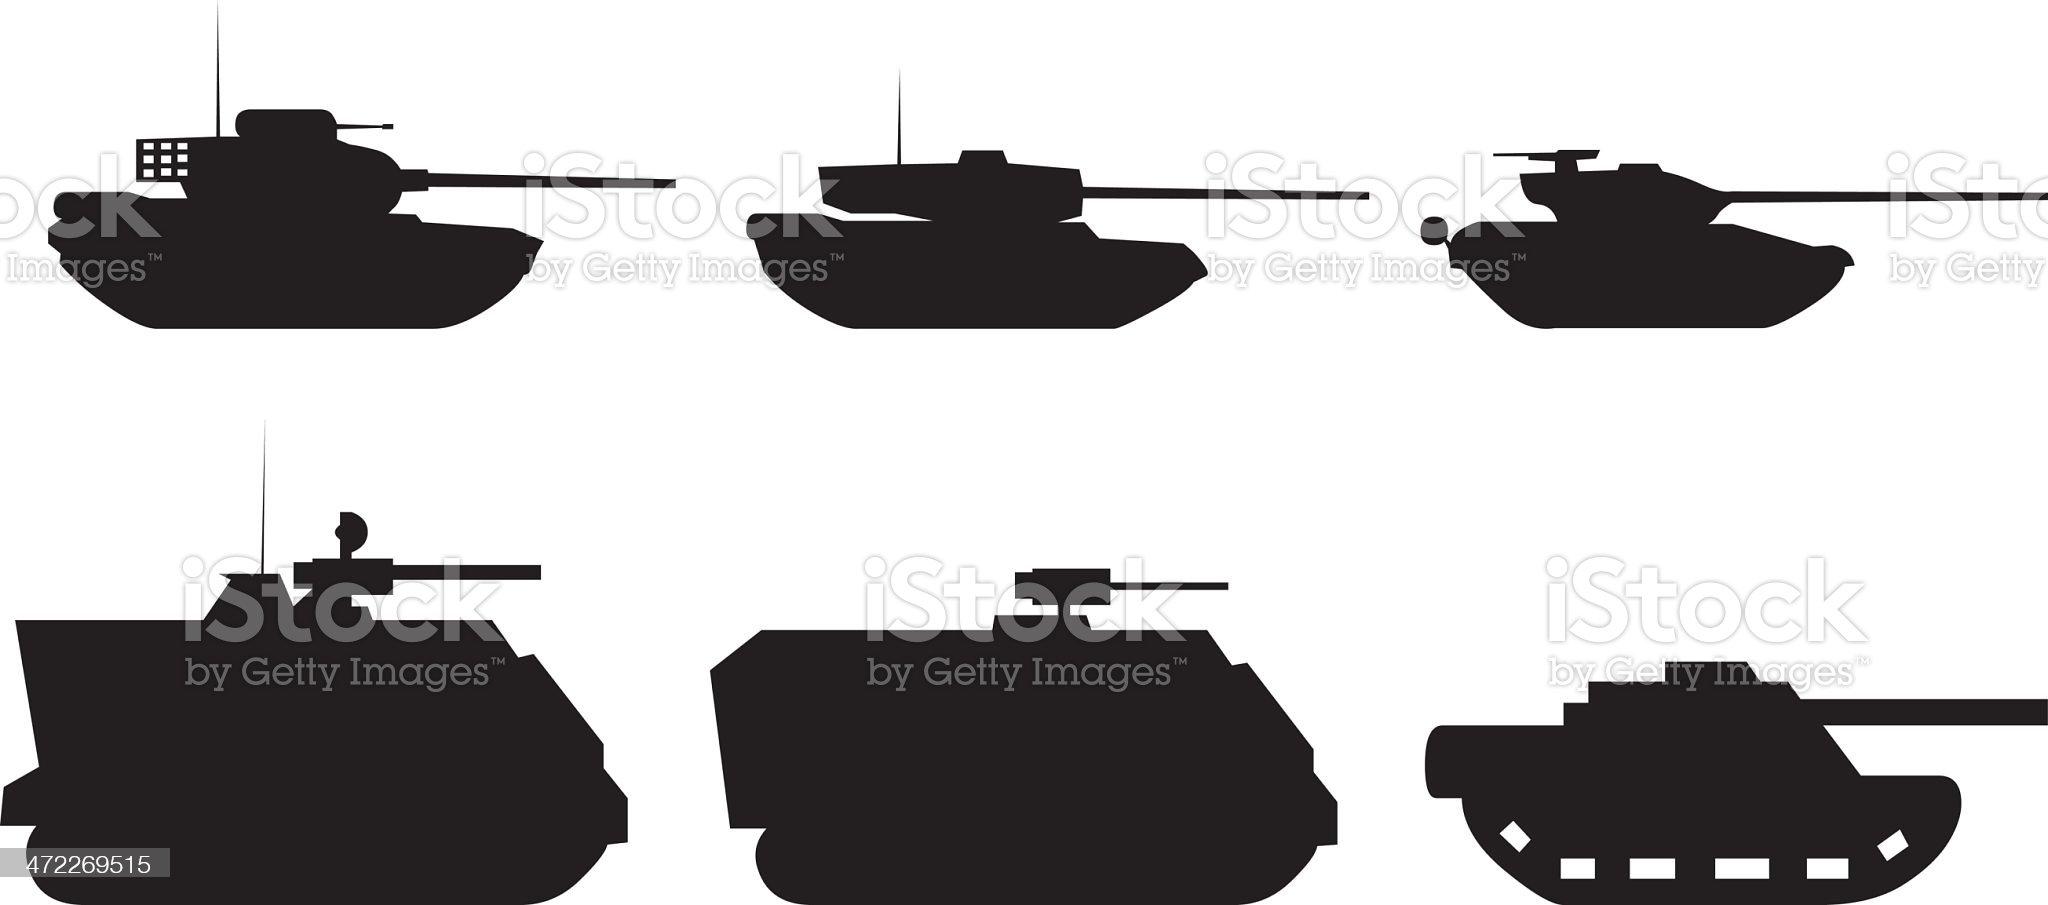 War Tanks (Vector) royalty-free stock vector art